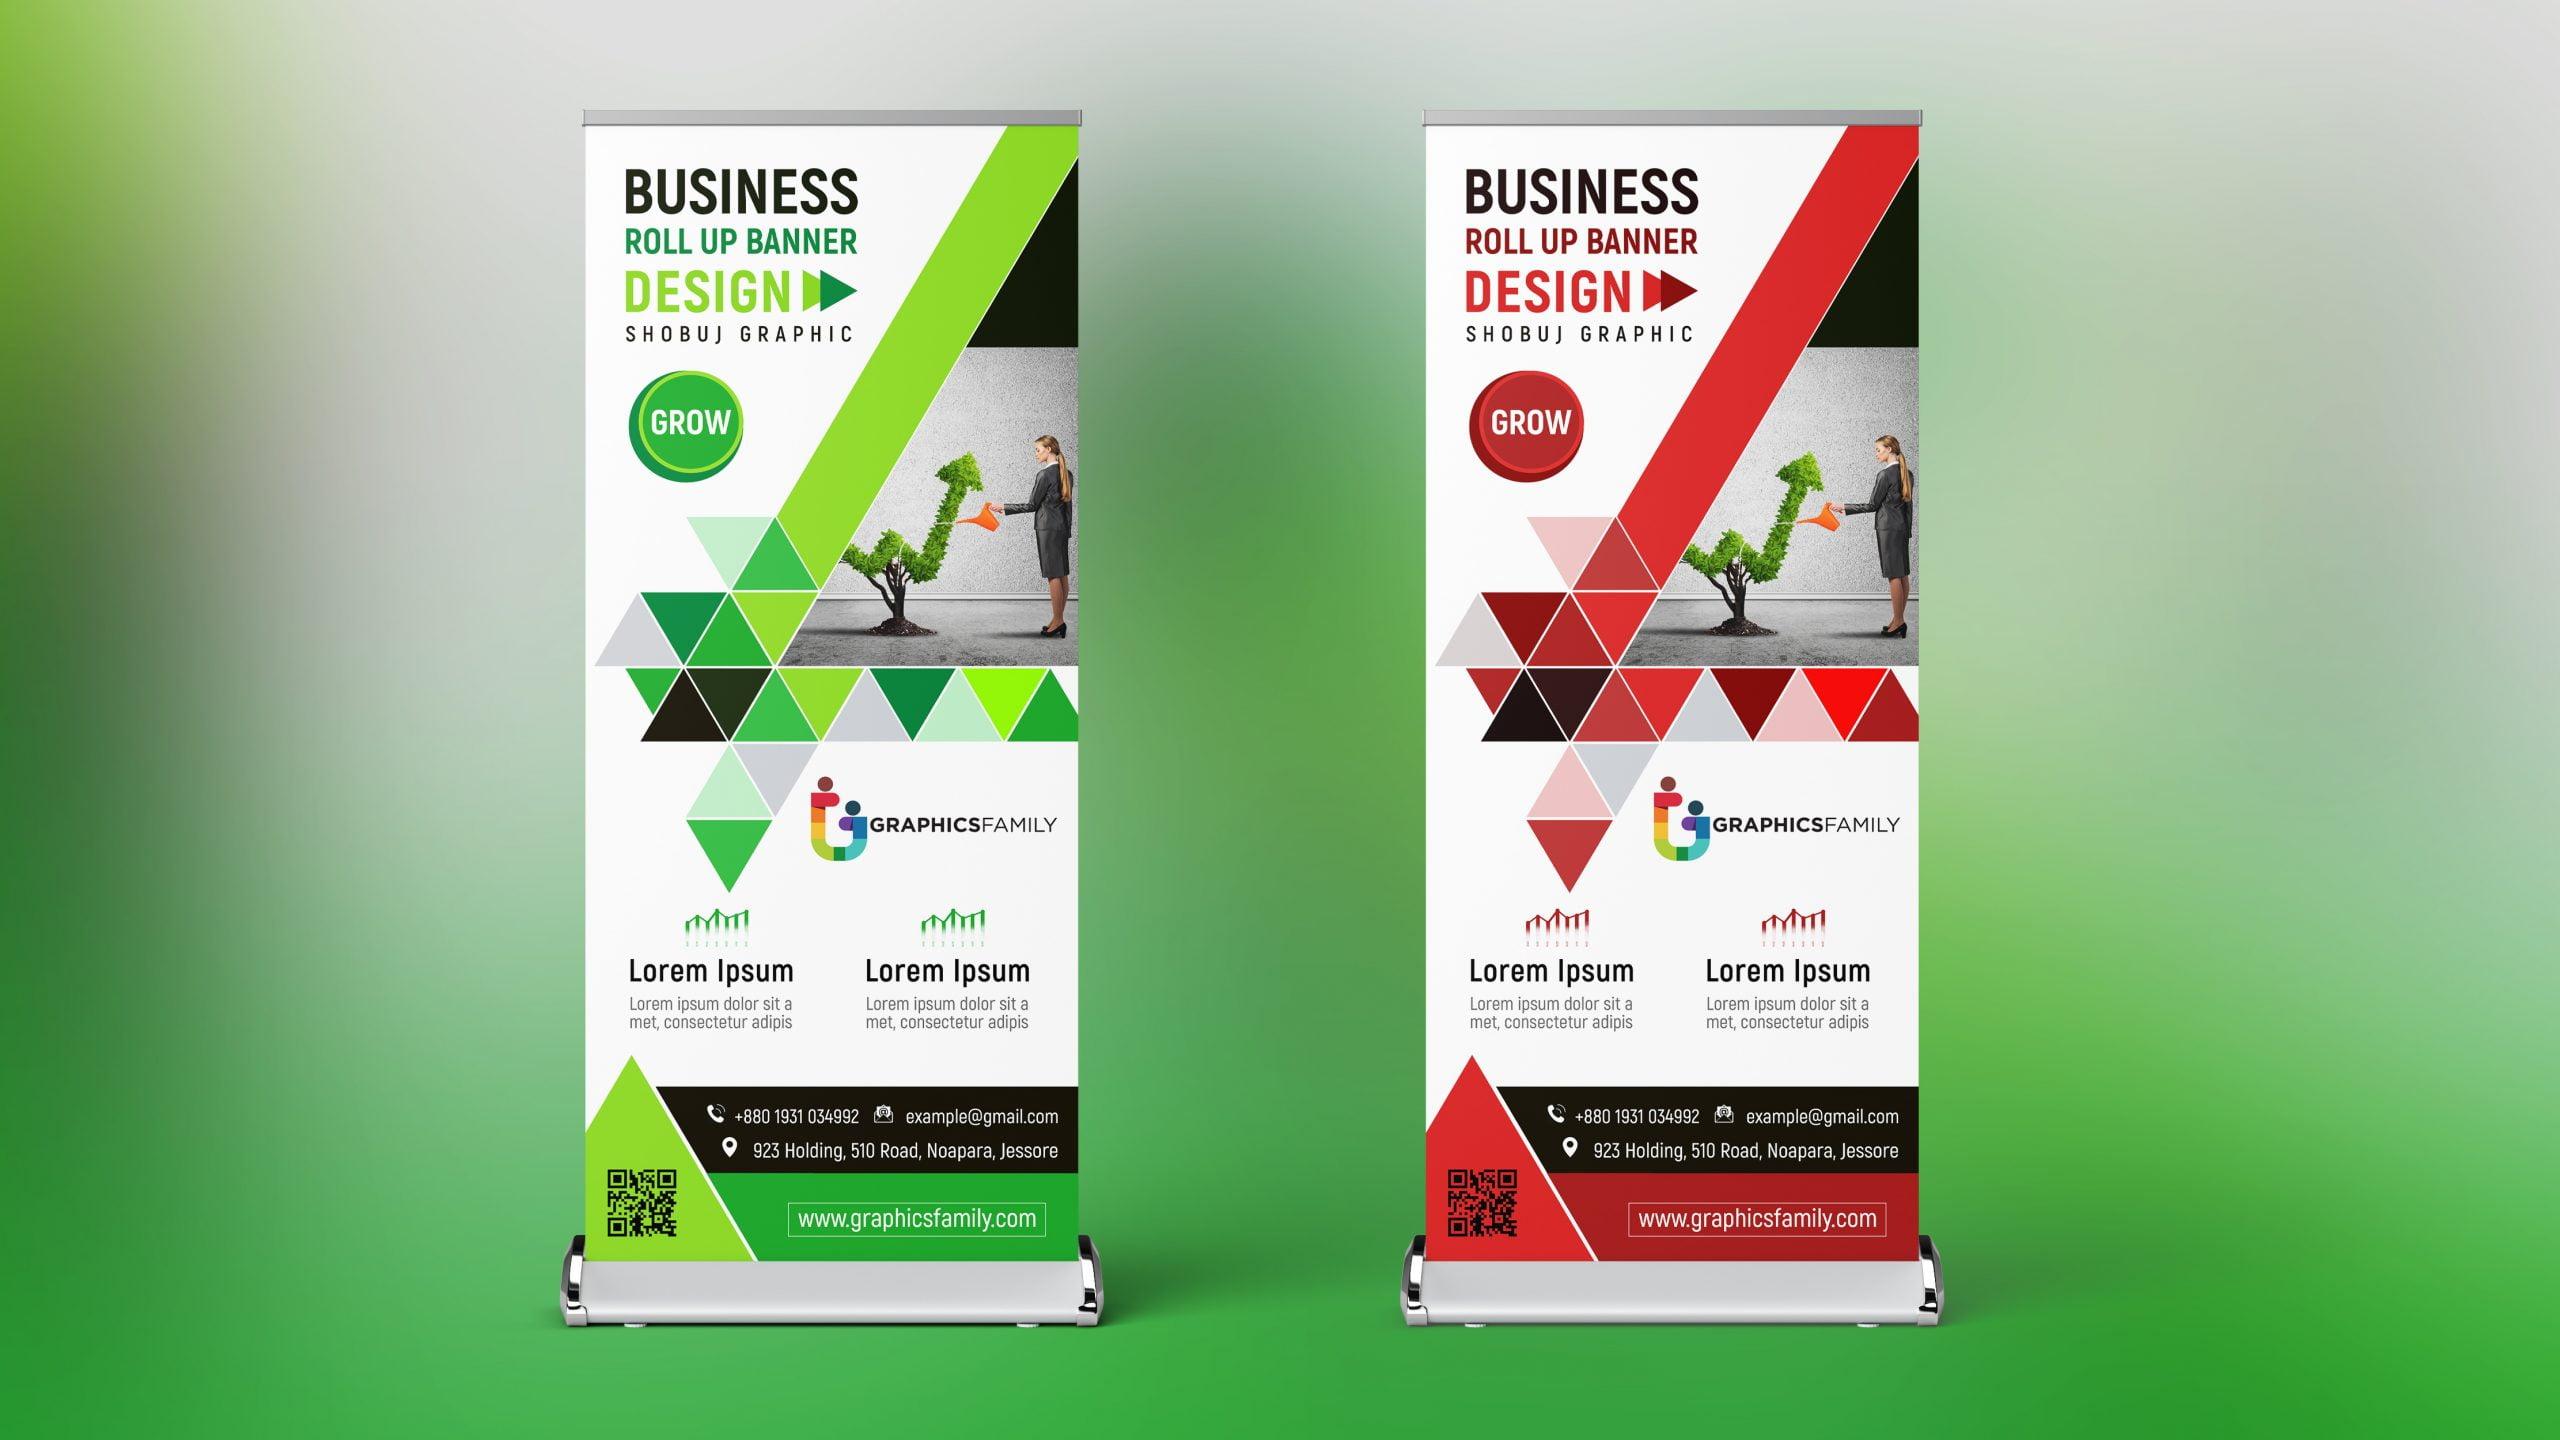 Modern-Professional-Business-Roll-Up-Banner-Design-Download